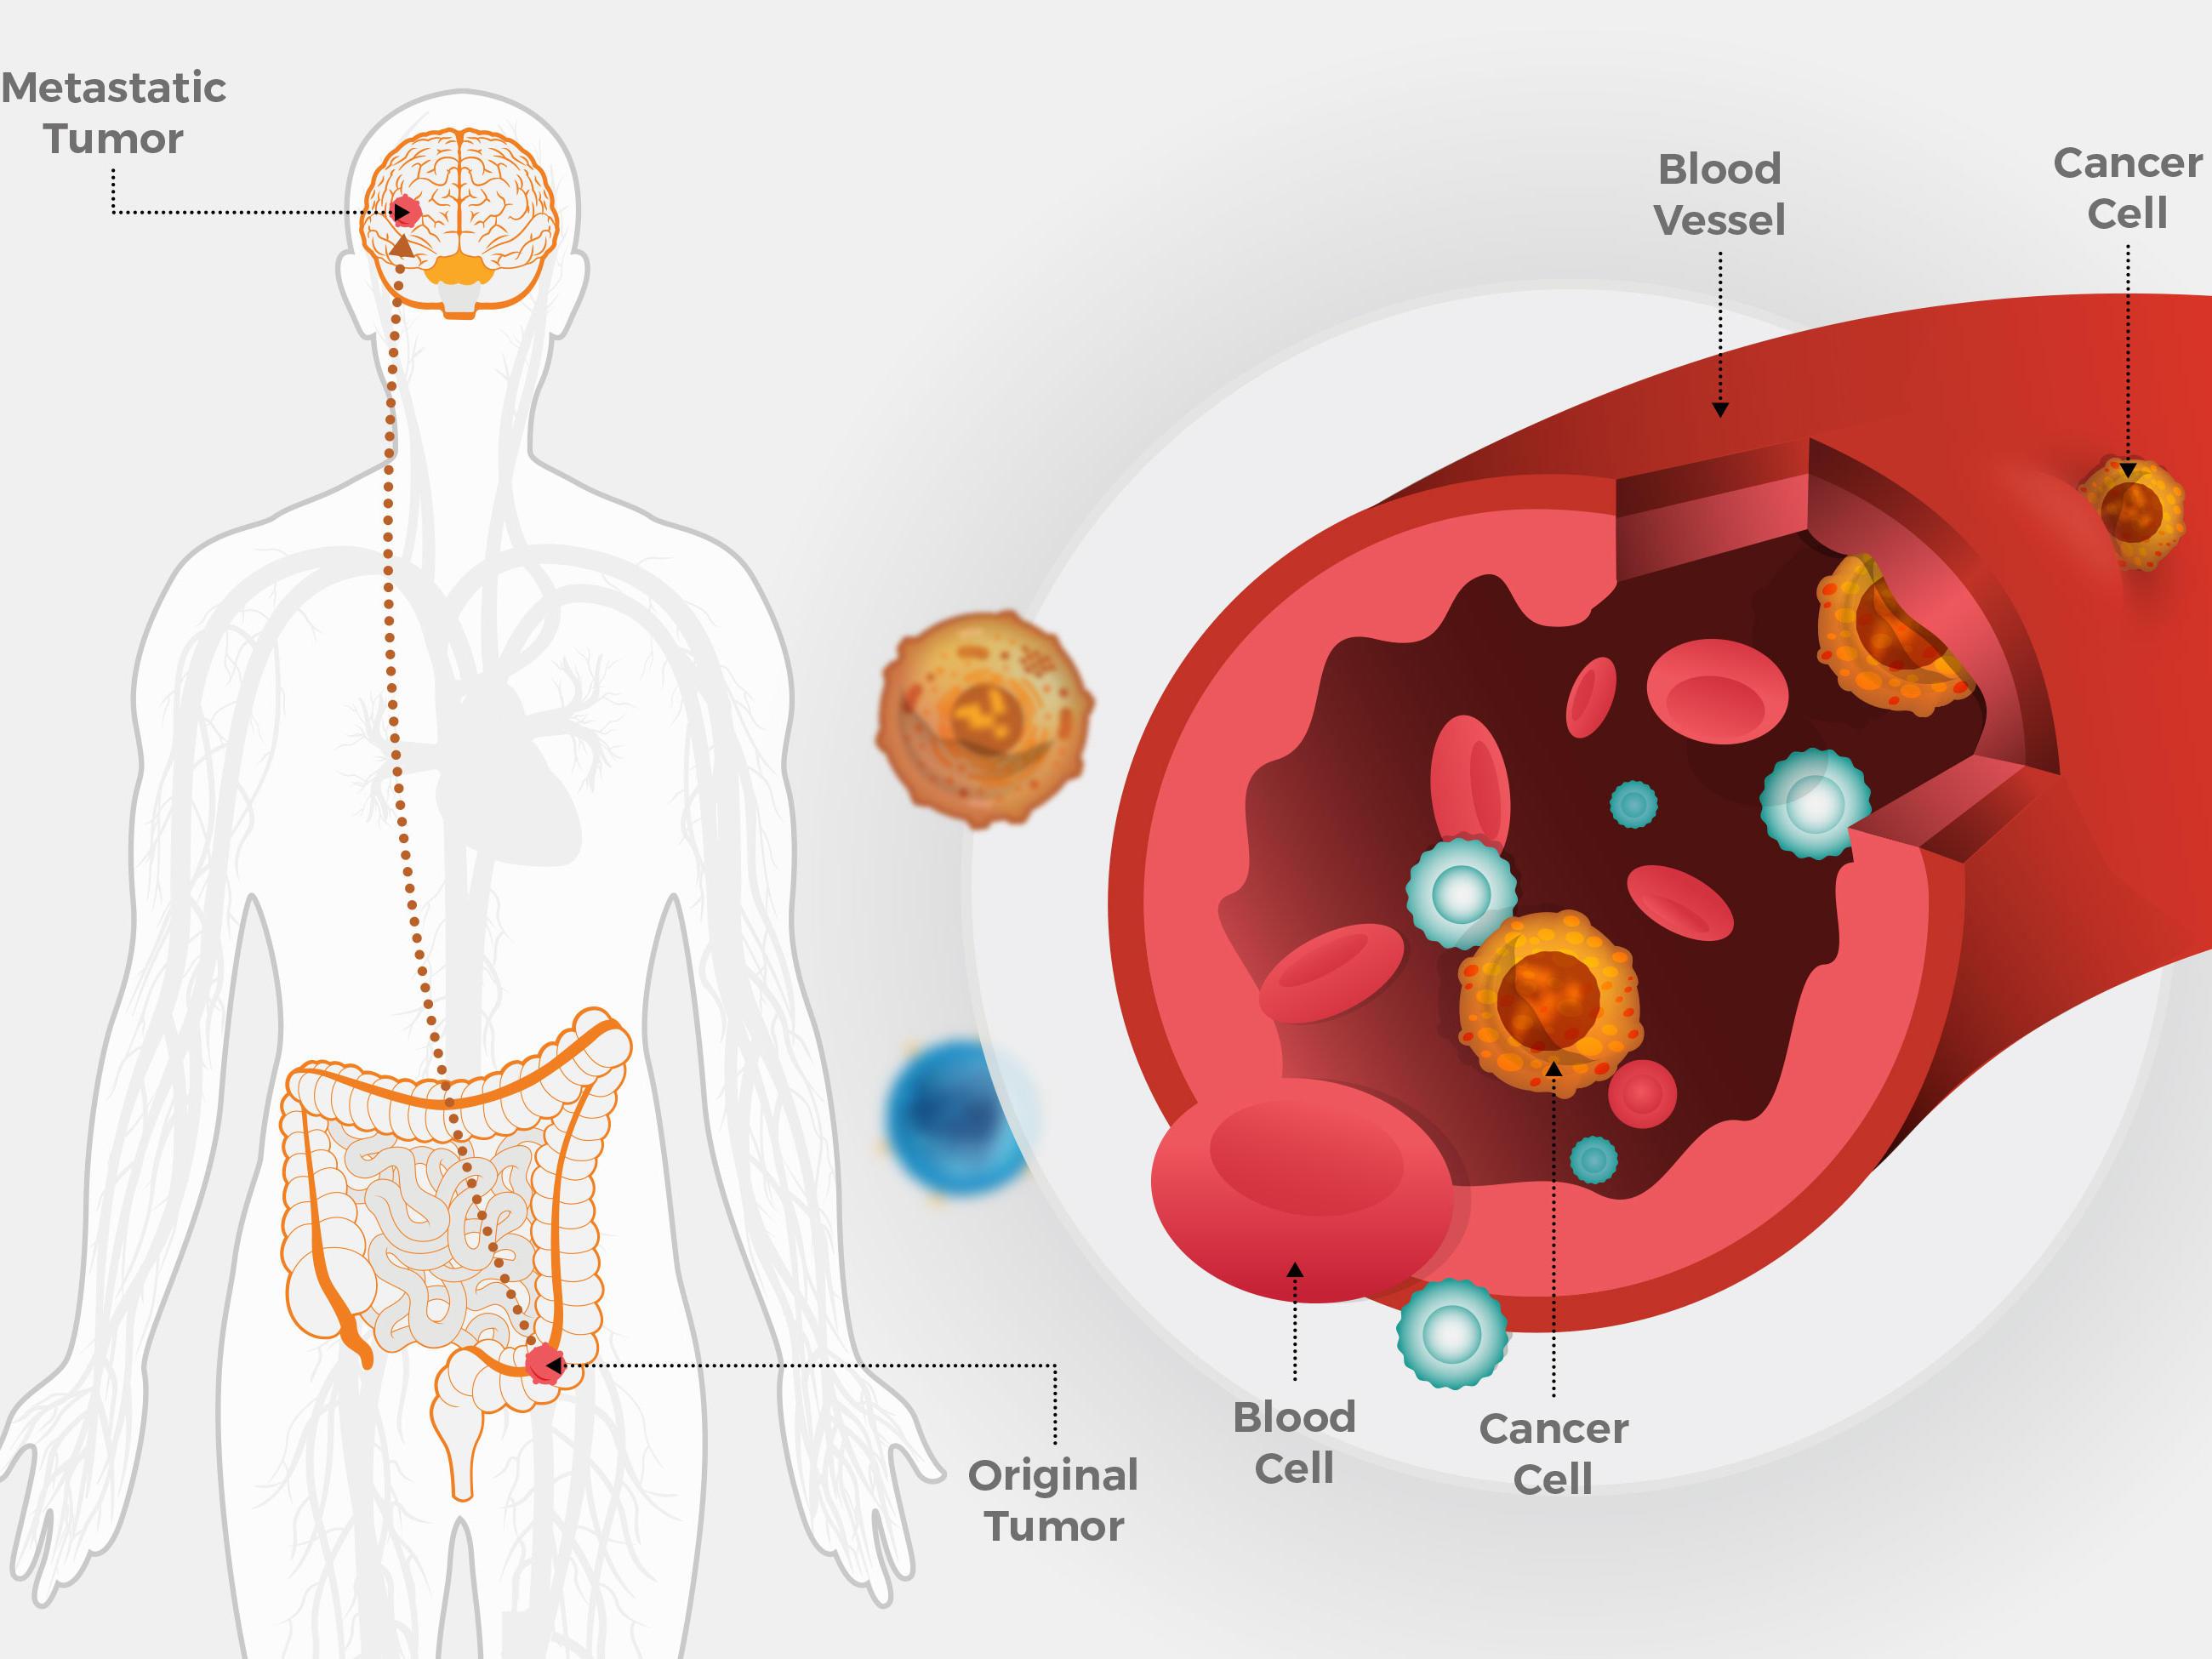 cancer at metastatic